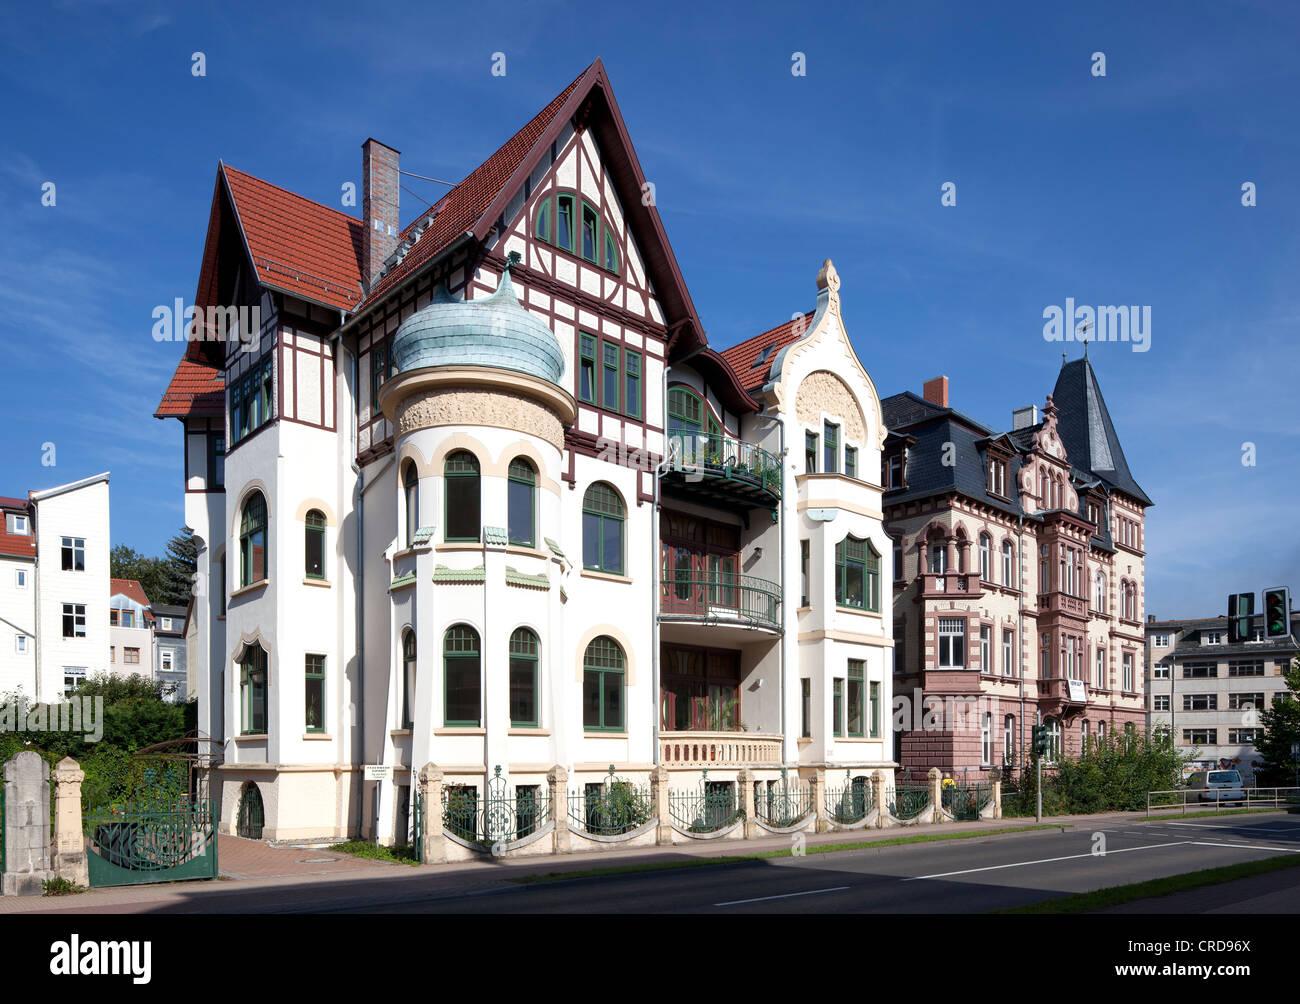 Townhouse, Art Nouveau, Eisenach, Thuringia, Germany, Europe, PublicGround - Stock Image